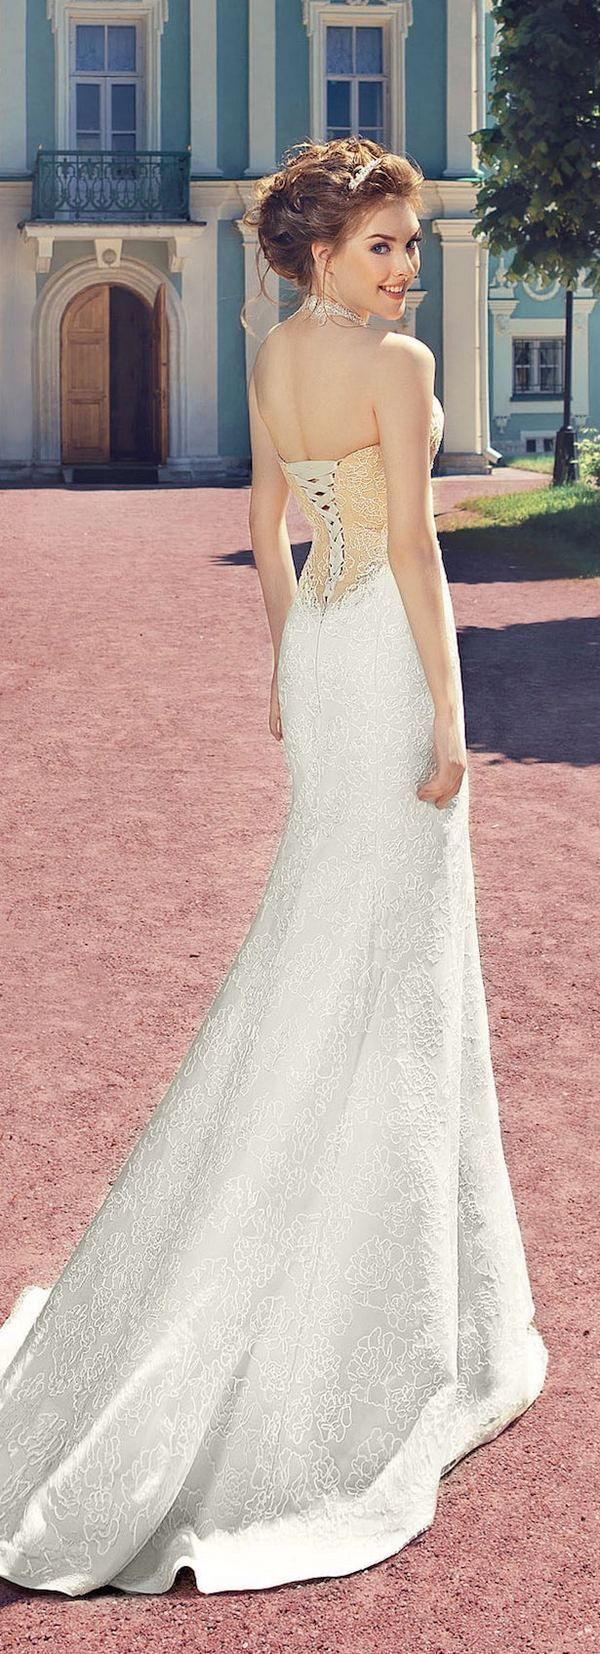 41 best Wedding dresses images on Pinterest   Short wedding gowns ...